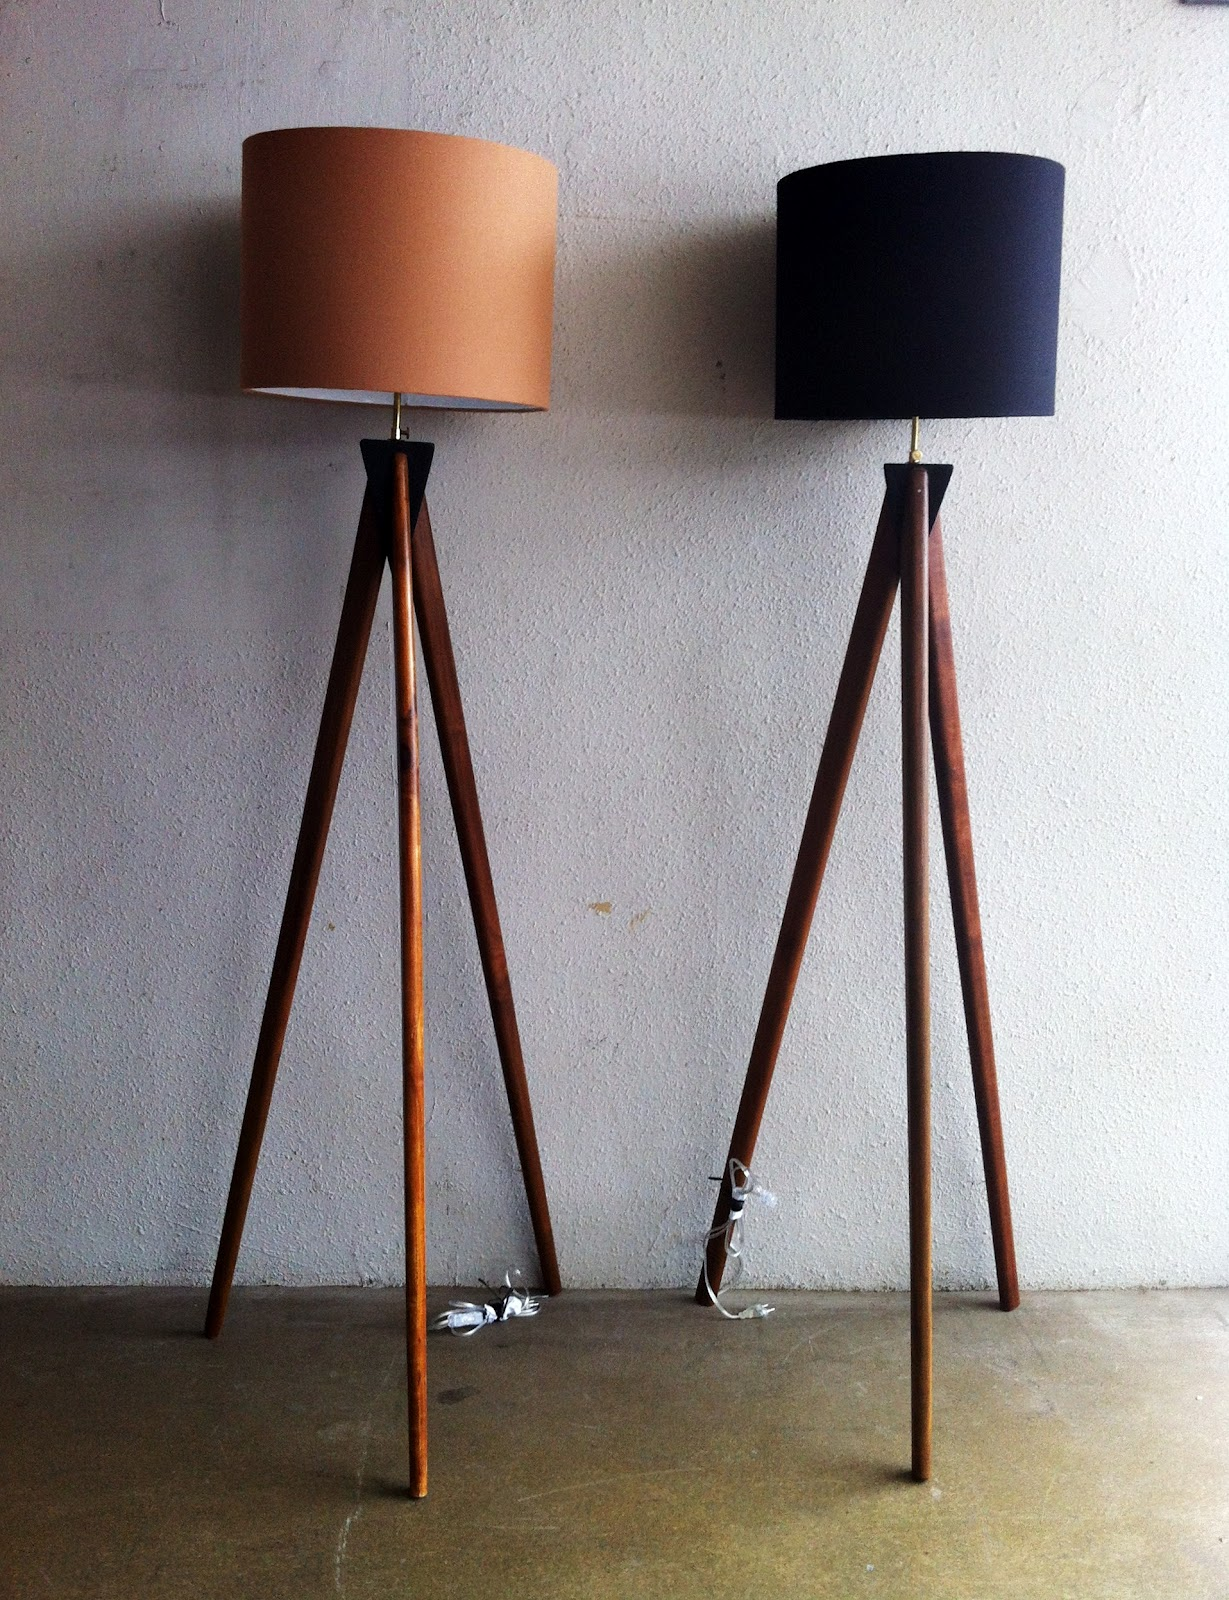 the gallery for scandinavian art designs. Black Bedroom Furniture Sets. Home Design Ideas